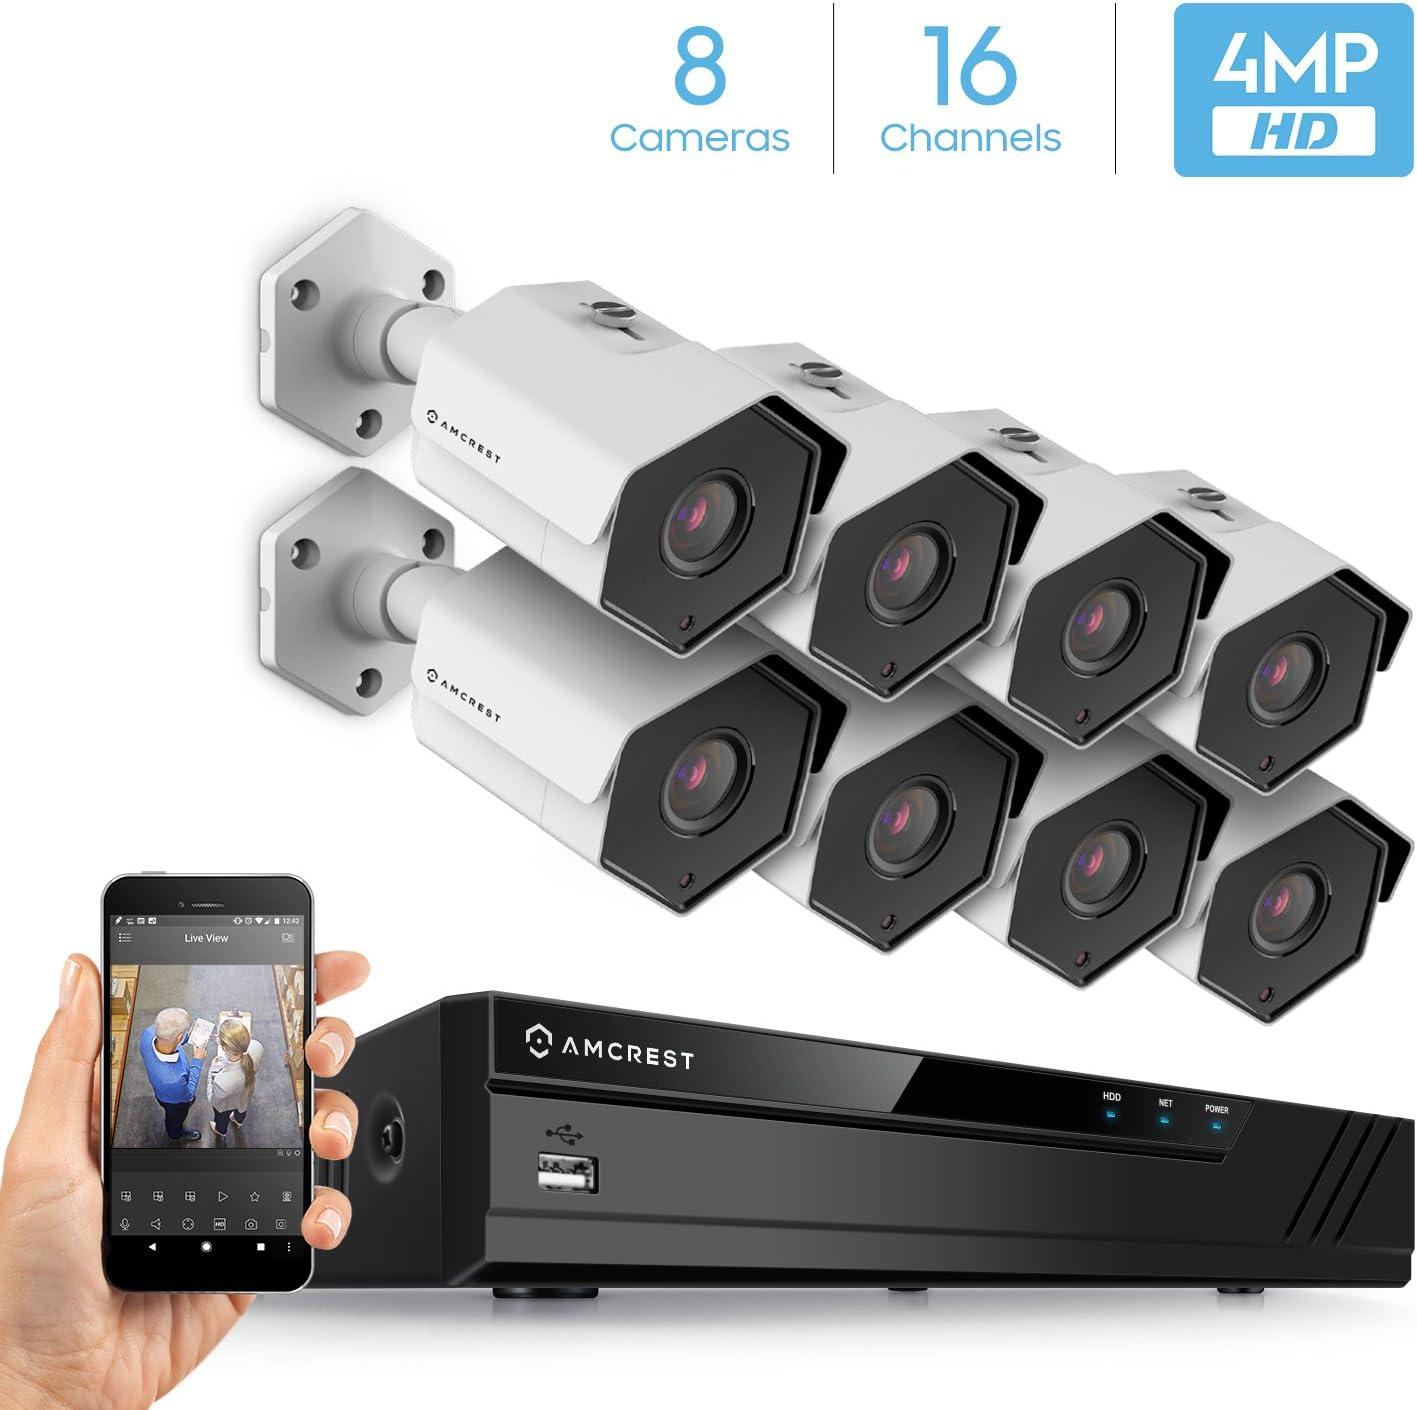 Amcrest 4MP Security Camera System, w 4K 16CH 8-Port PoE NVR, 8 x 4-Megapixel 3.6mm Wide Angle Lens Weatherproof Metal Bullet POE IP Cameras, NV4116E-HS-IP4M-1026EW8 White